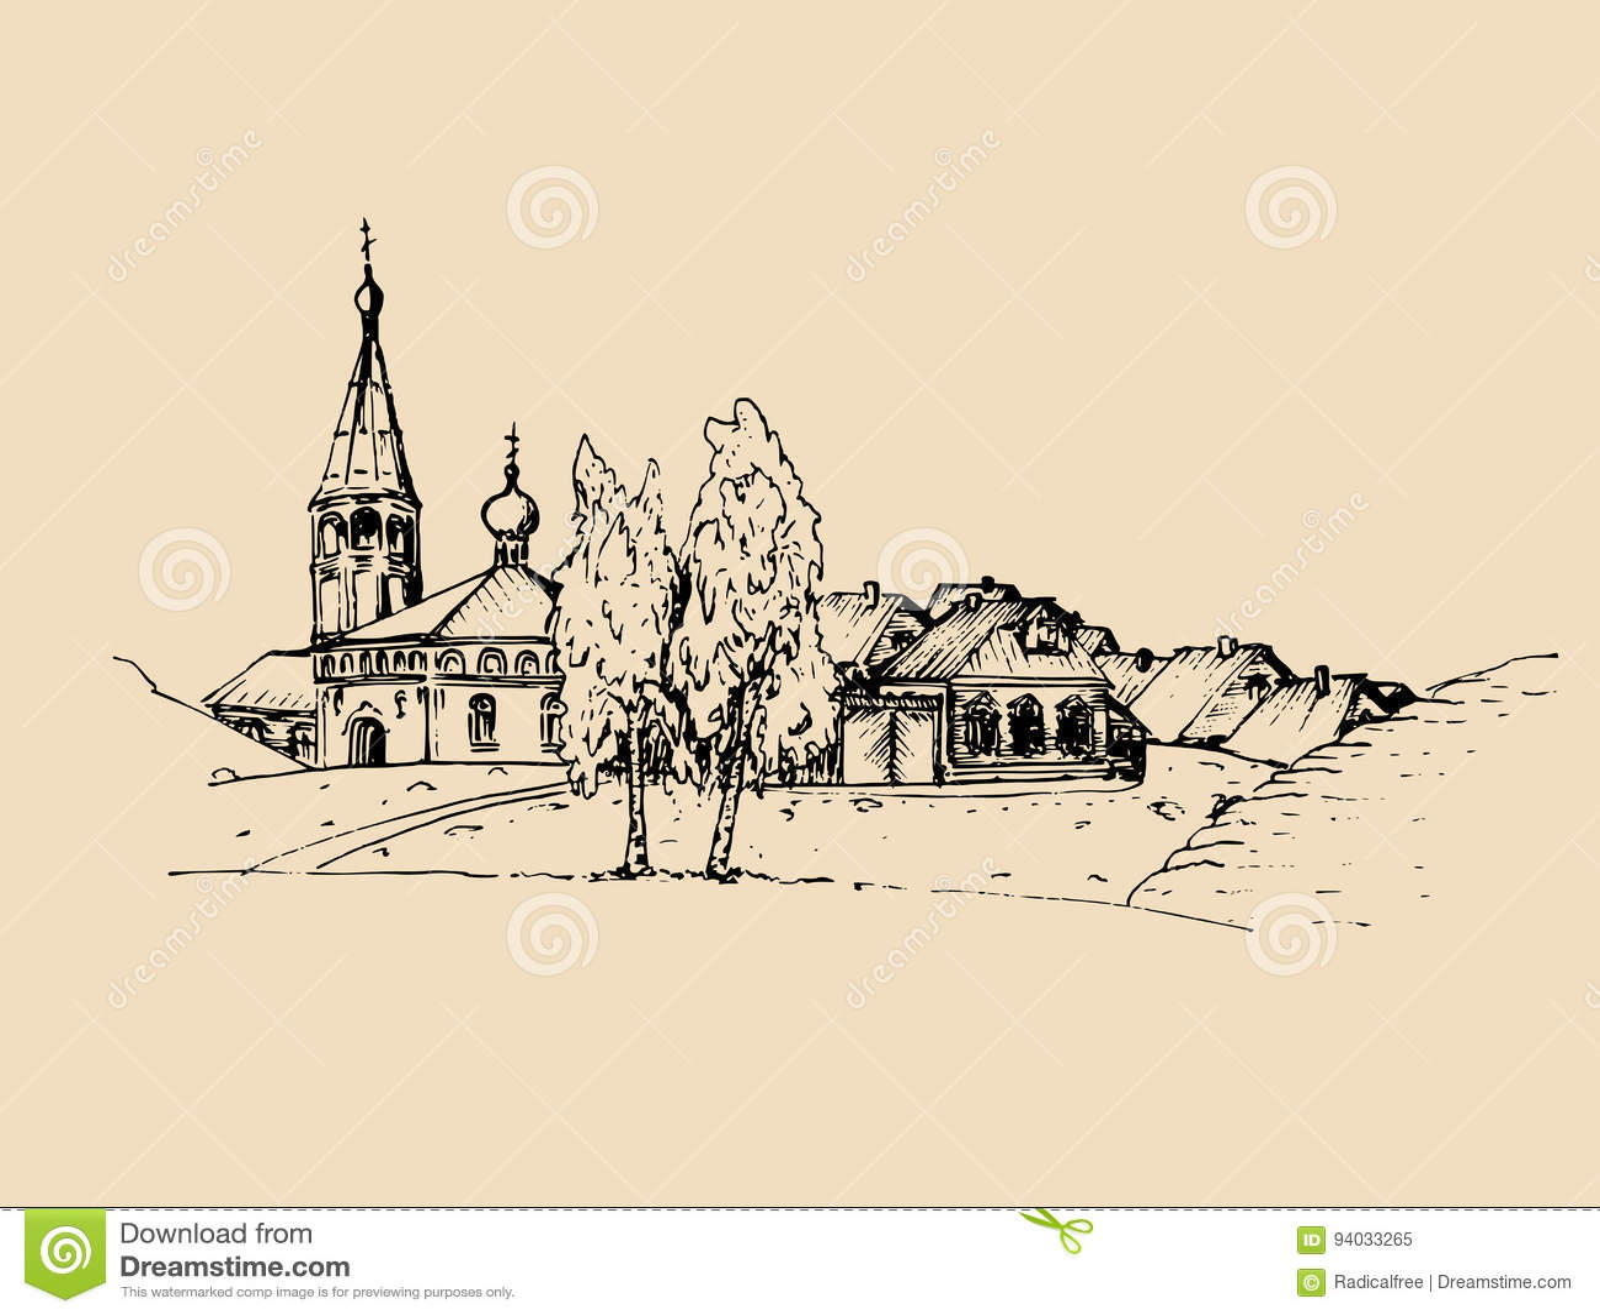 Vector Rural Landscape Illustration. Hand Drawn Russian Countryside ... for Farmland Sketch  177nar